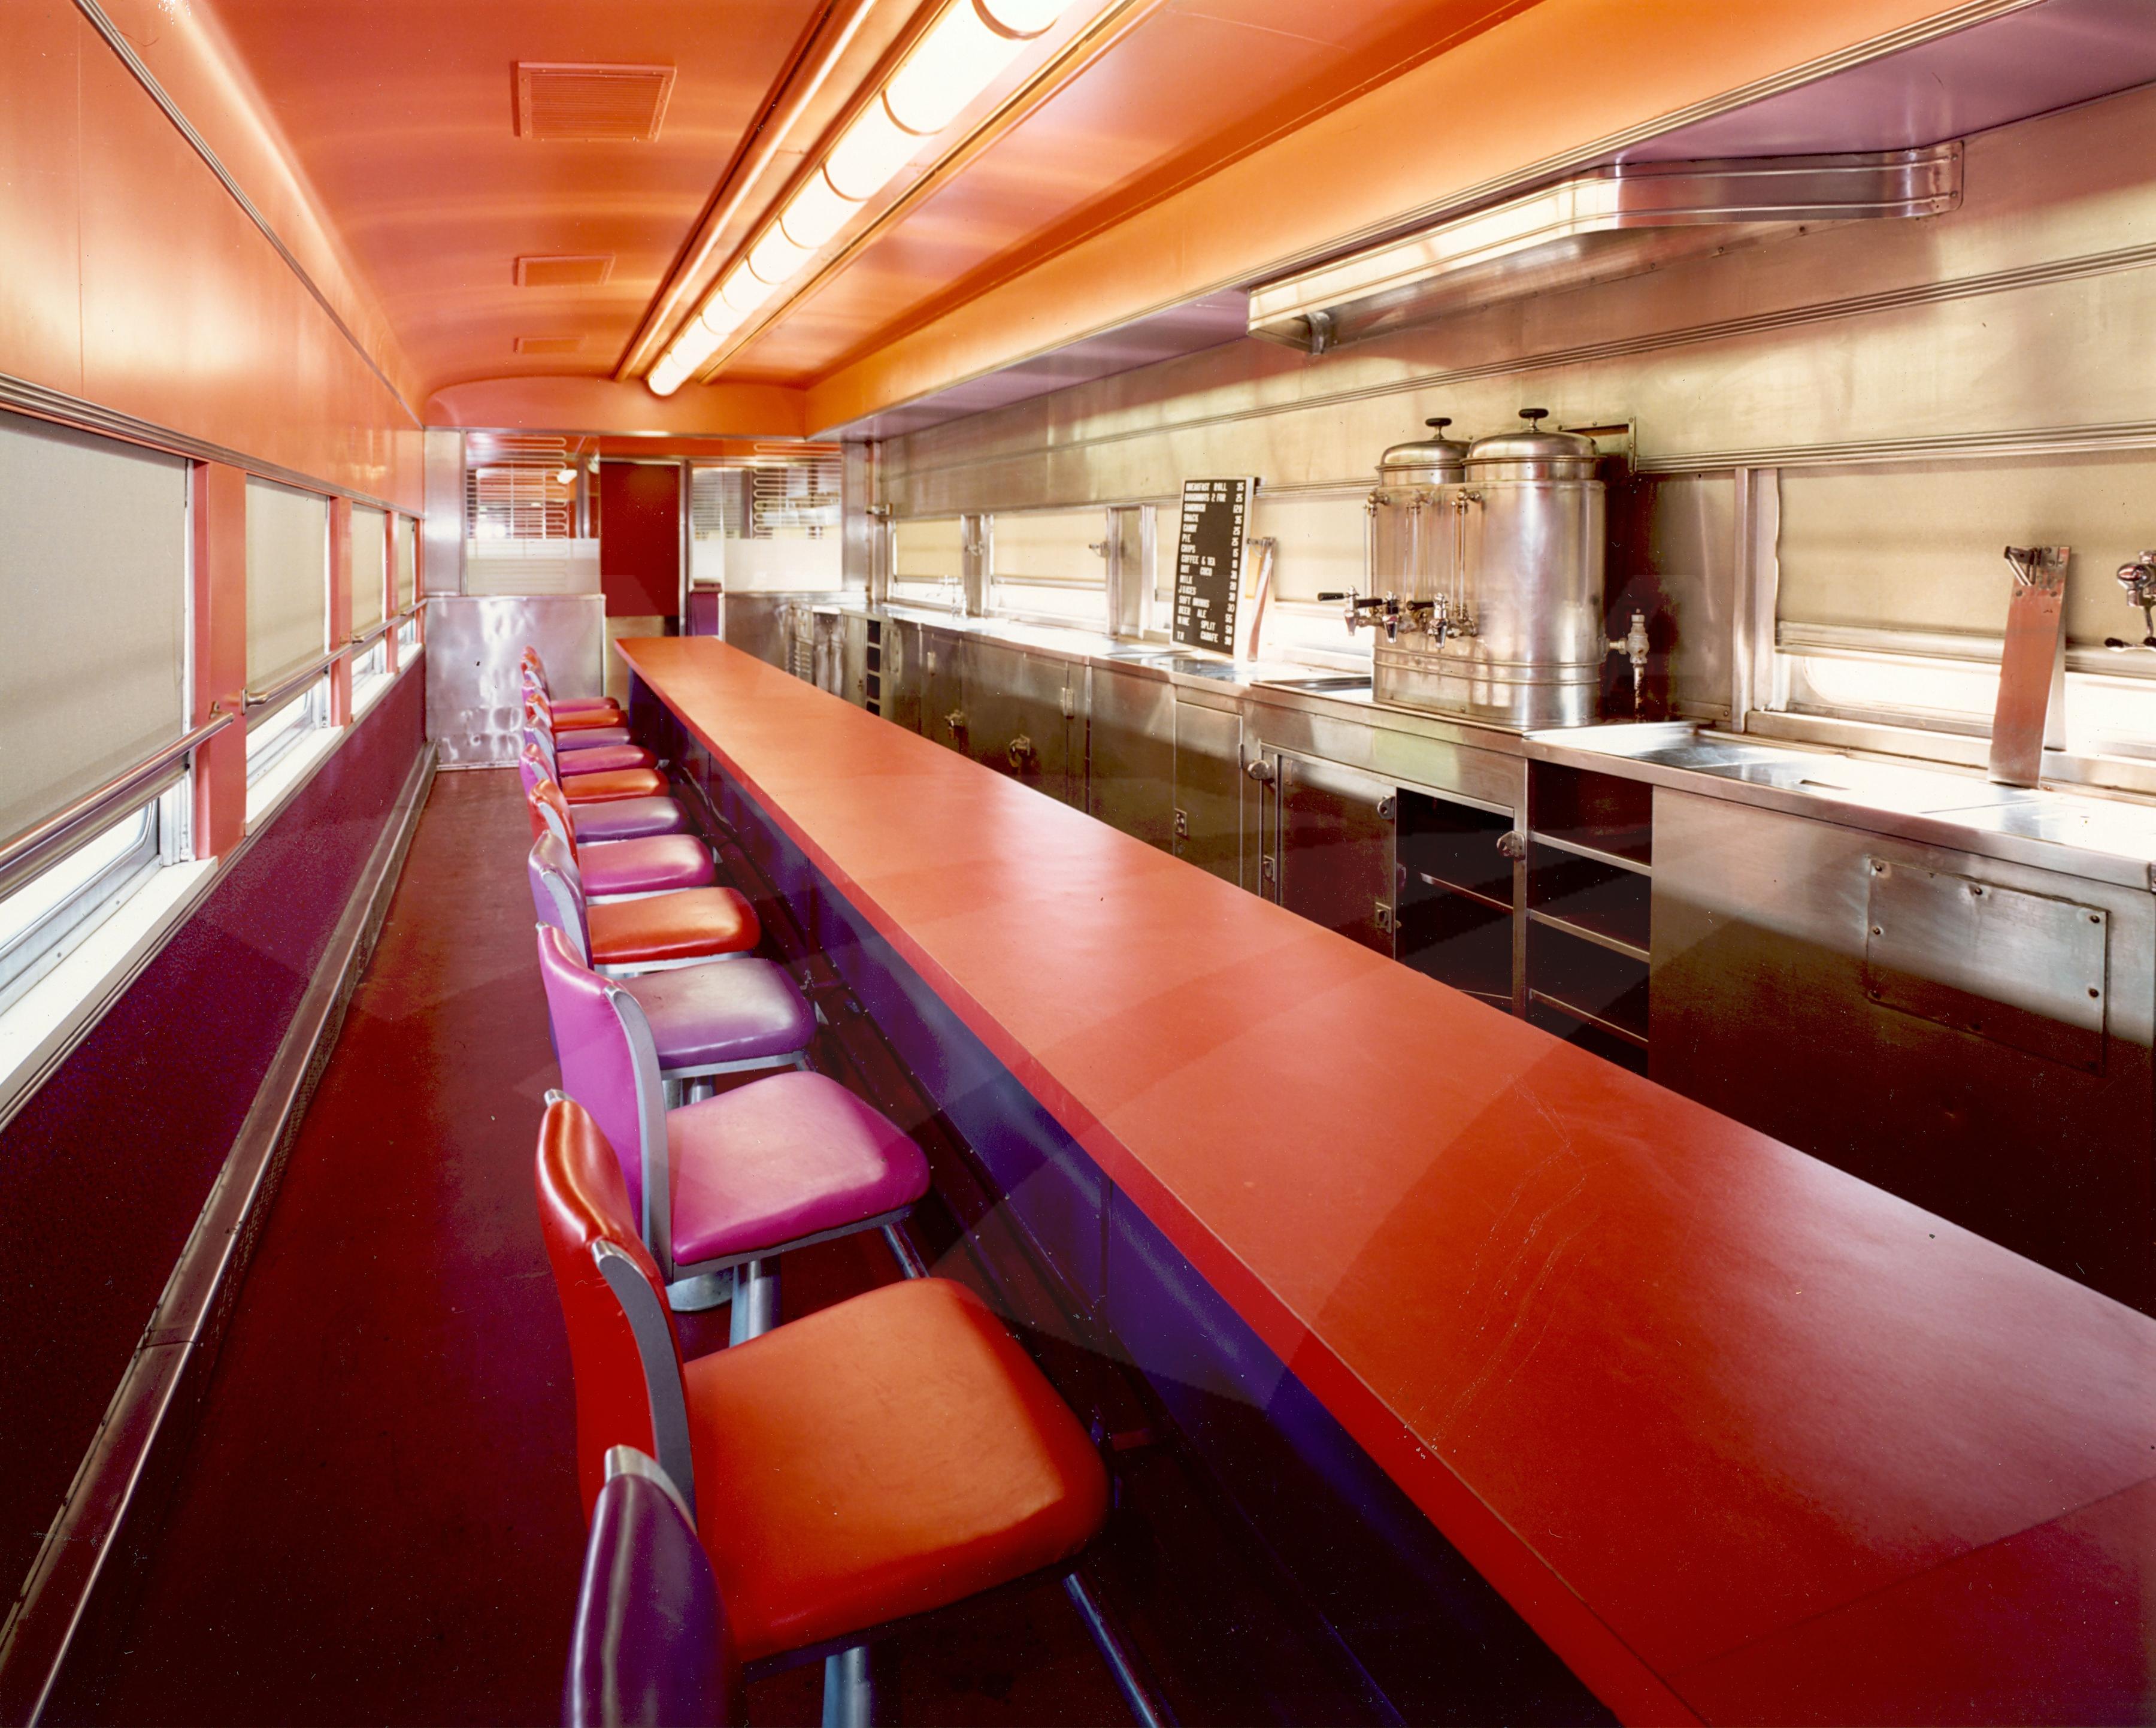 refurbished lunch counter diner dorm car no 8117 1970s amtrak history of america s railroad. Black Bedroom Furniture Sets. Home Design Ideas